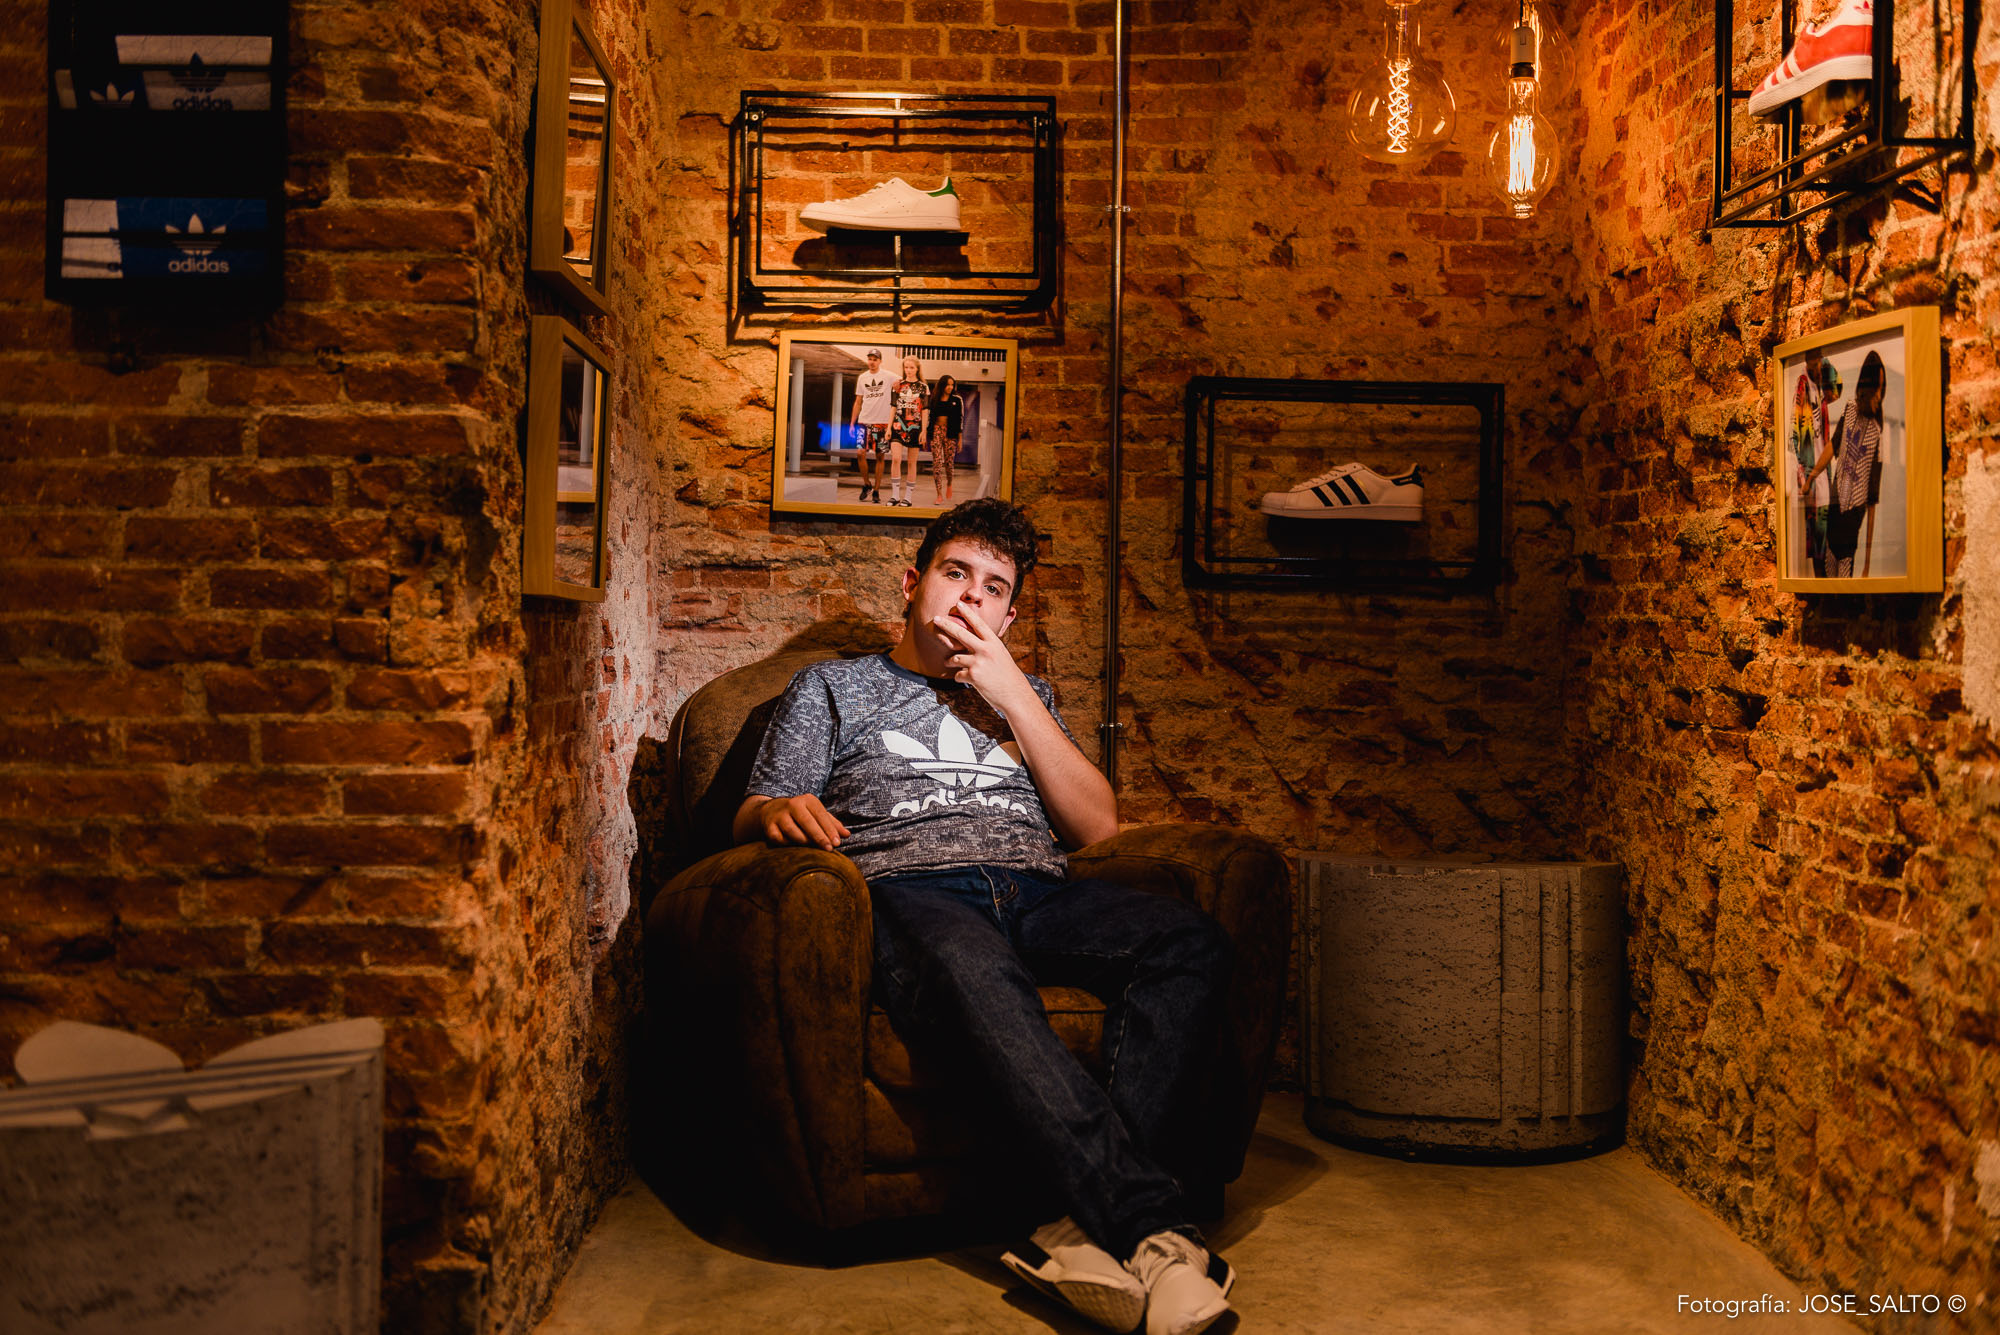 ADIDAS, ARKANO, JOSE SALTO, fotógrafo de eventos madrid